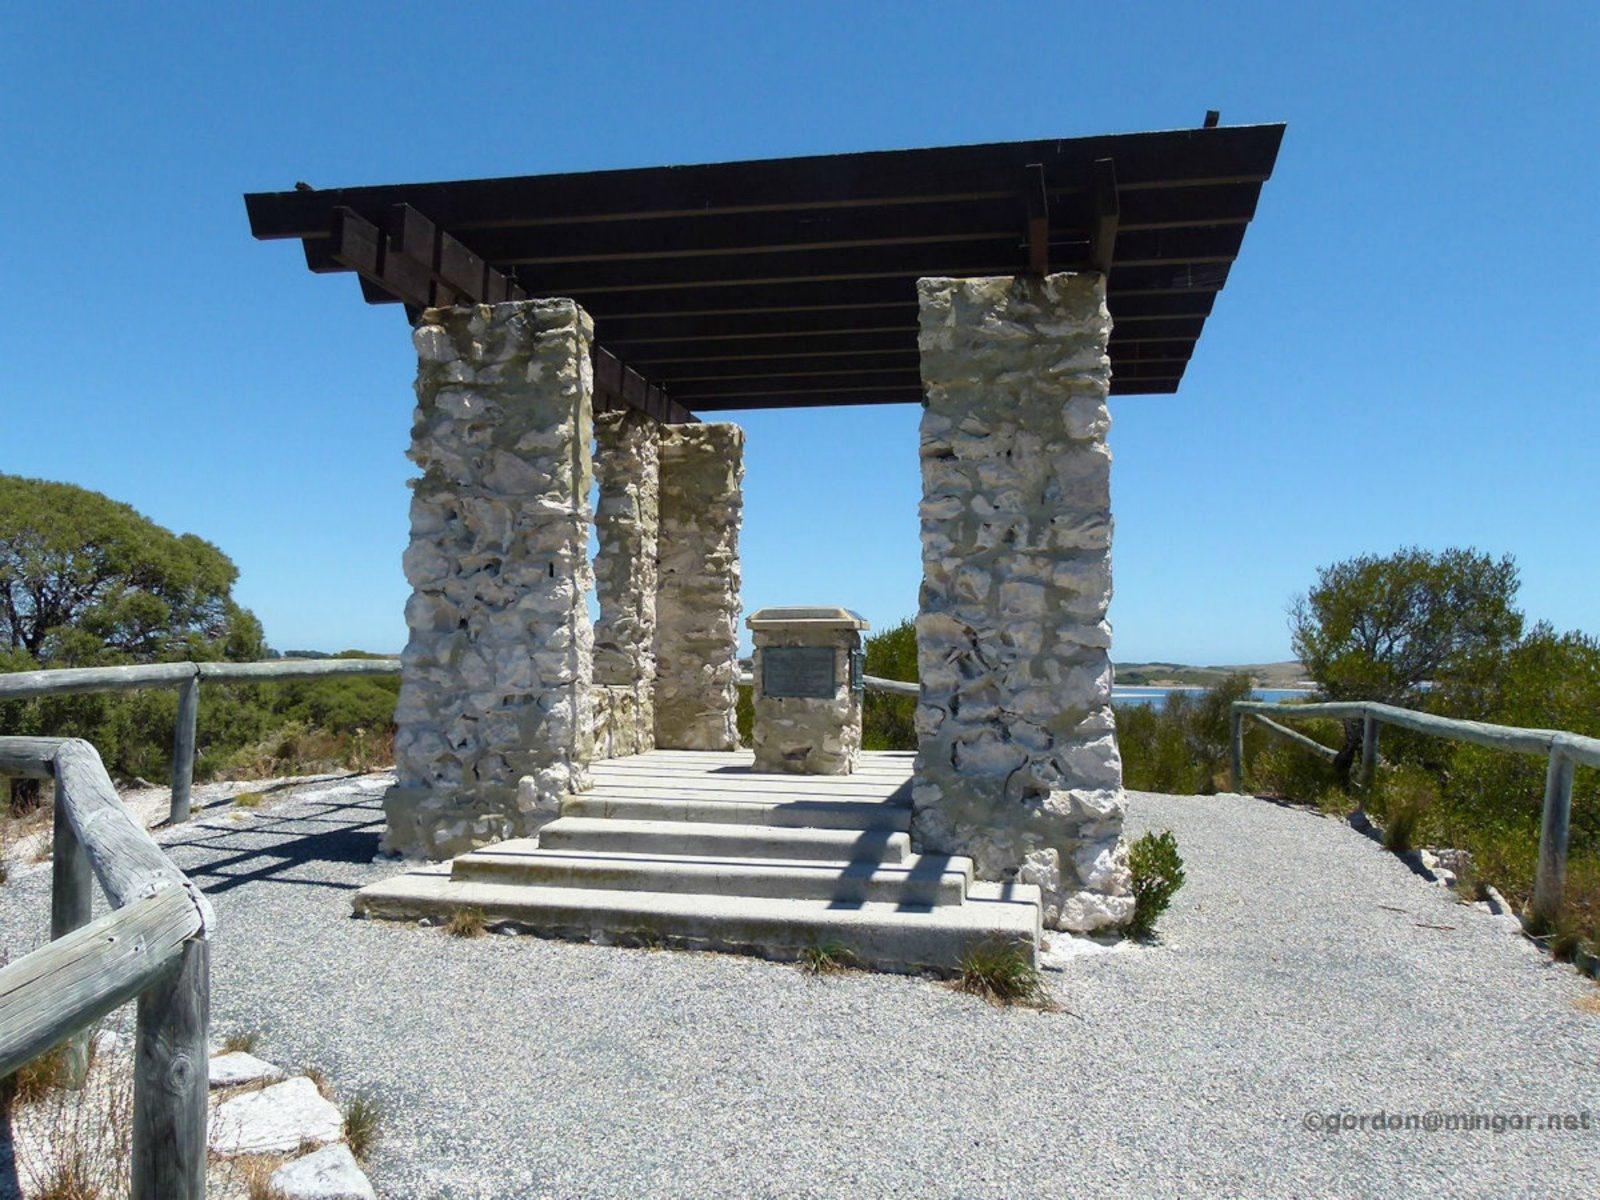 Vlamingh Lookout, Rottnest Island, Western Australia